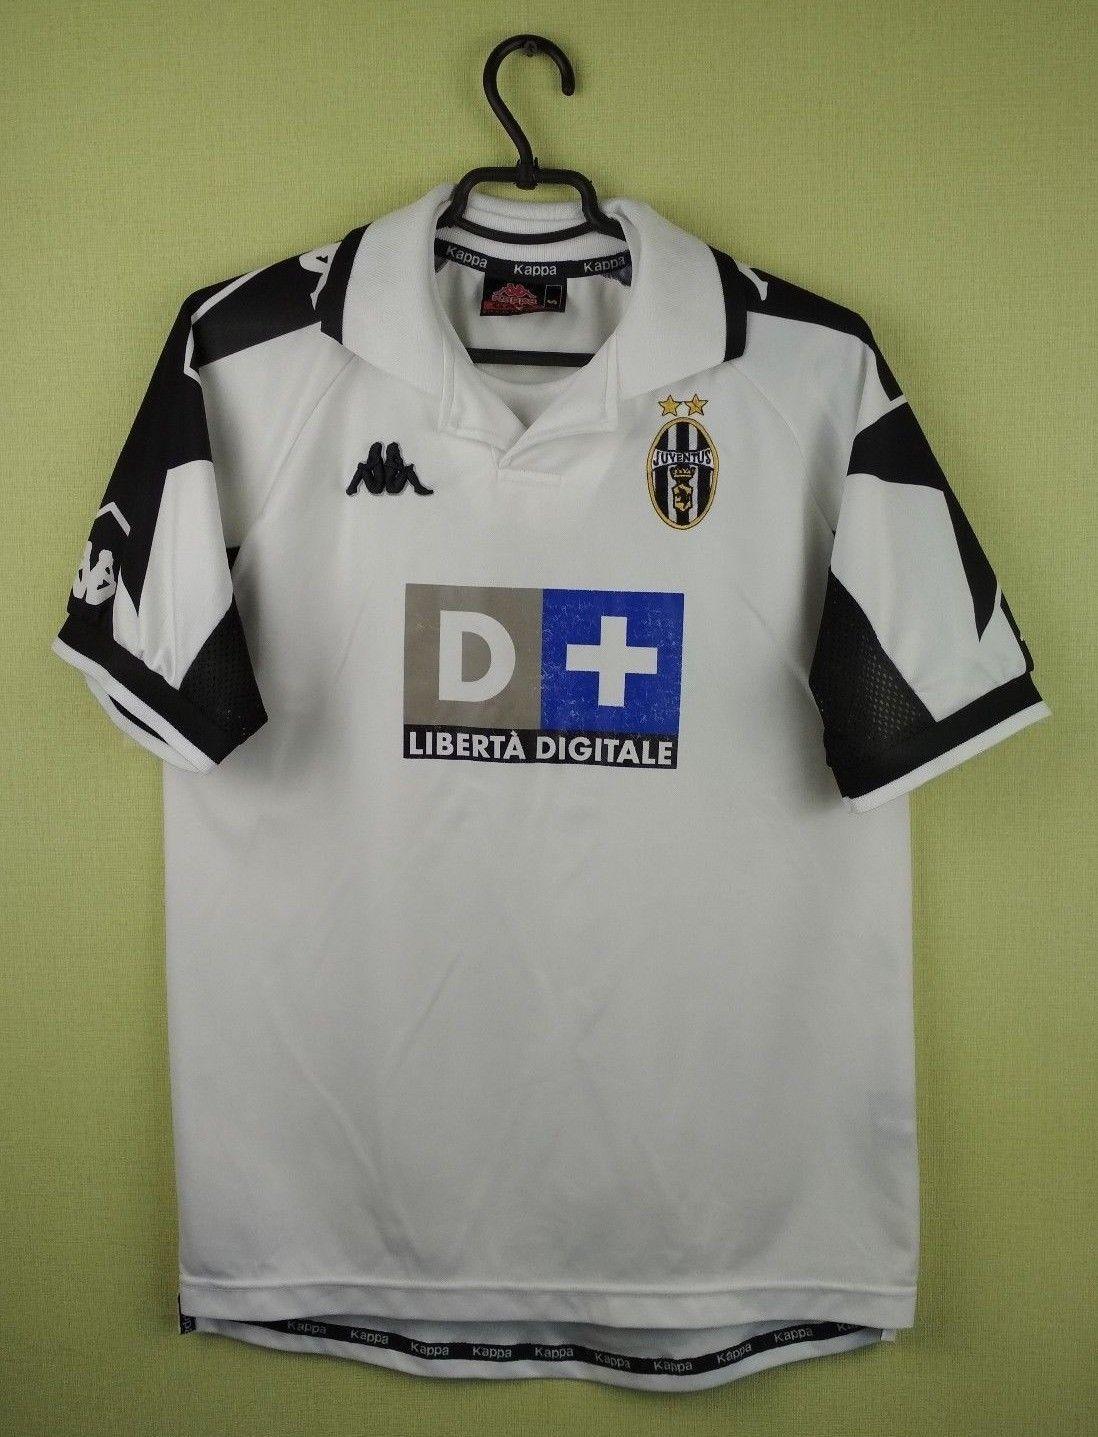 97a09ef7d Juventus jersey shirt 1999 2000 Away official kappa soccer football size S  (eBay Link)